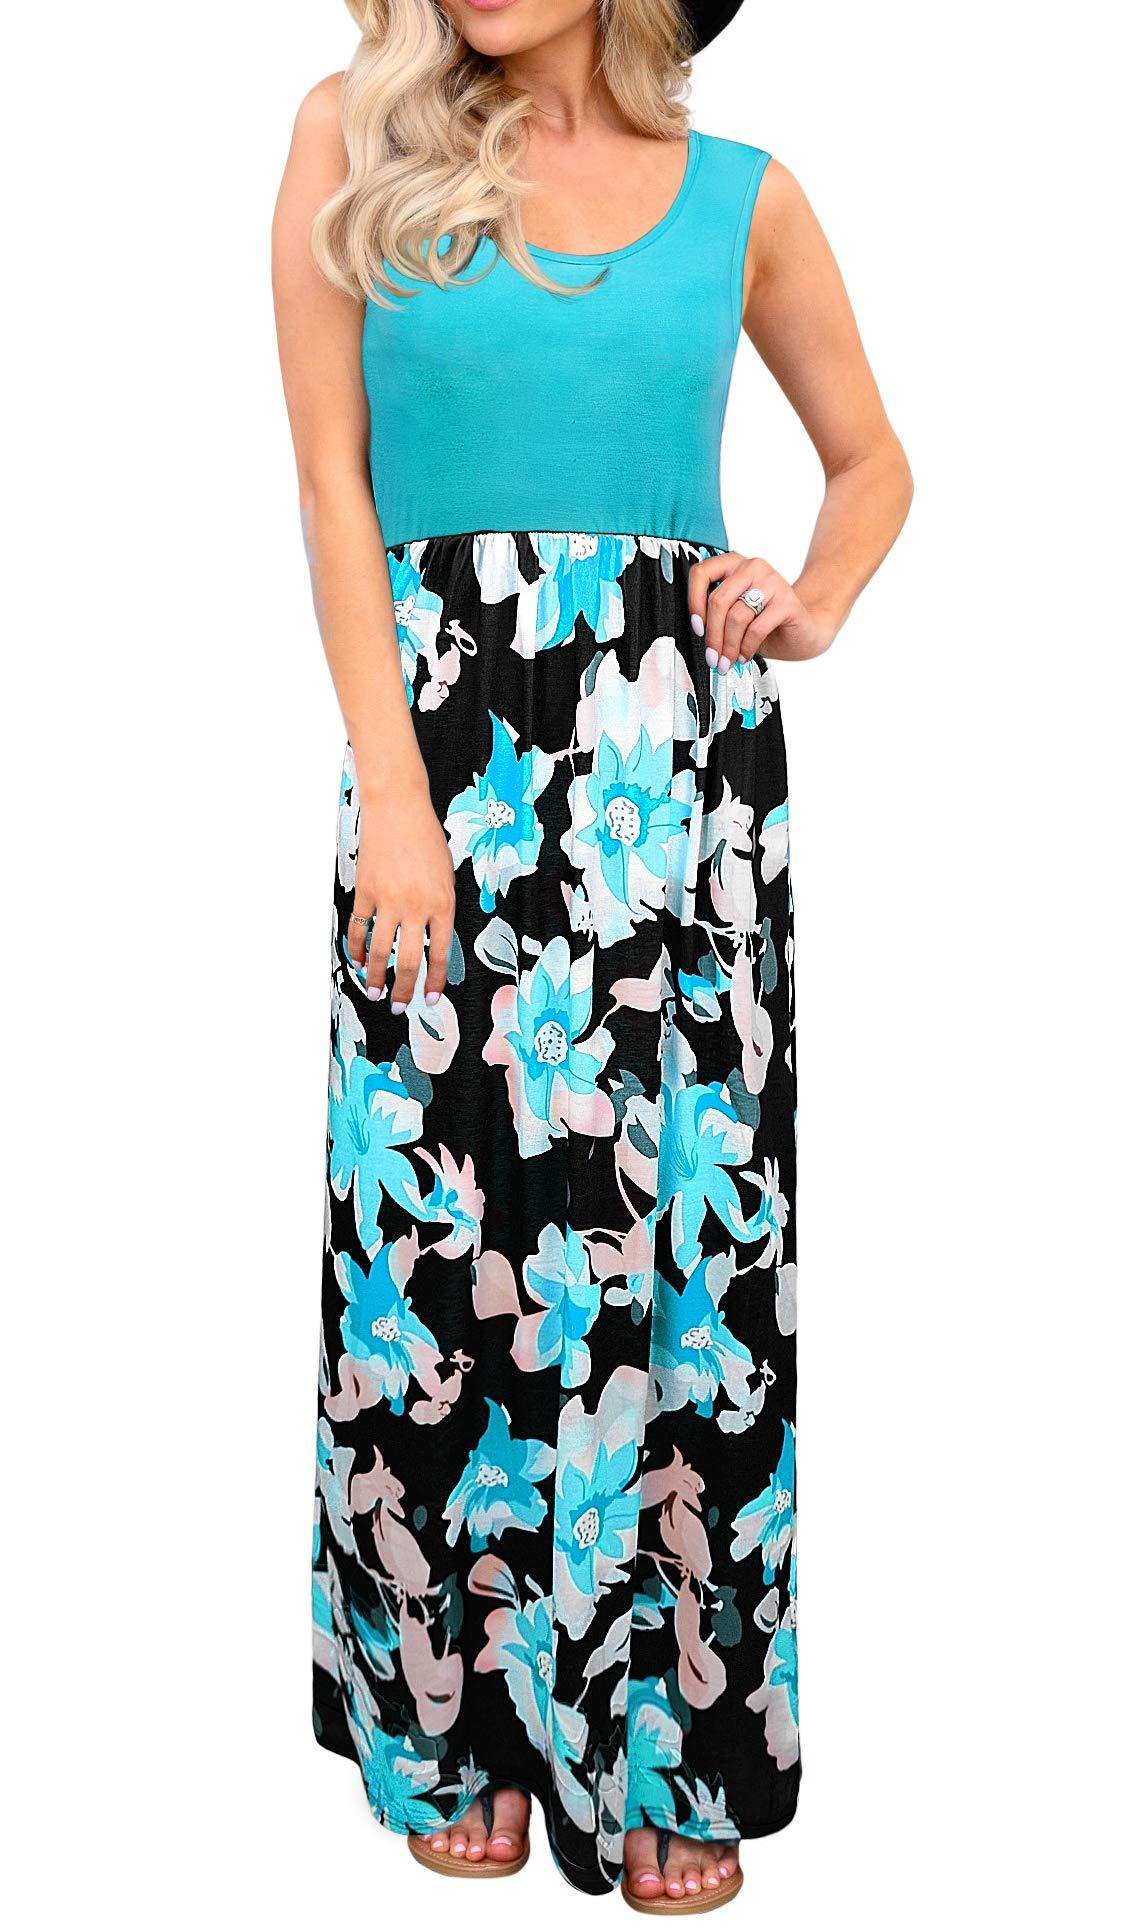 Available at Amazon: Aifer Women's Casual Sleeveless Maxi Dresses Floral Print Sundress Beach Dress